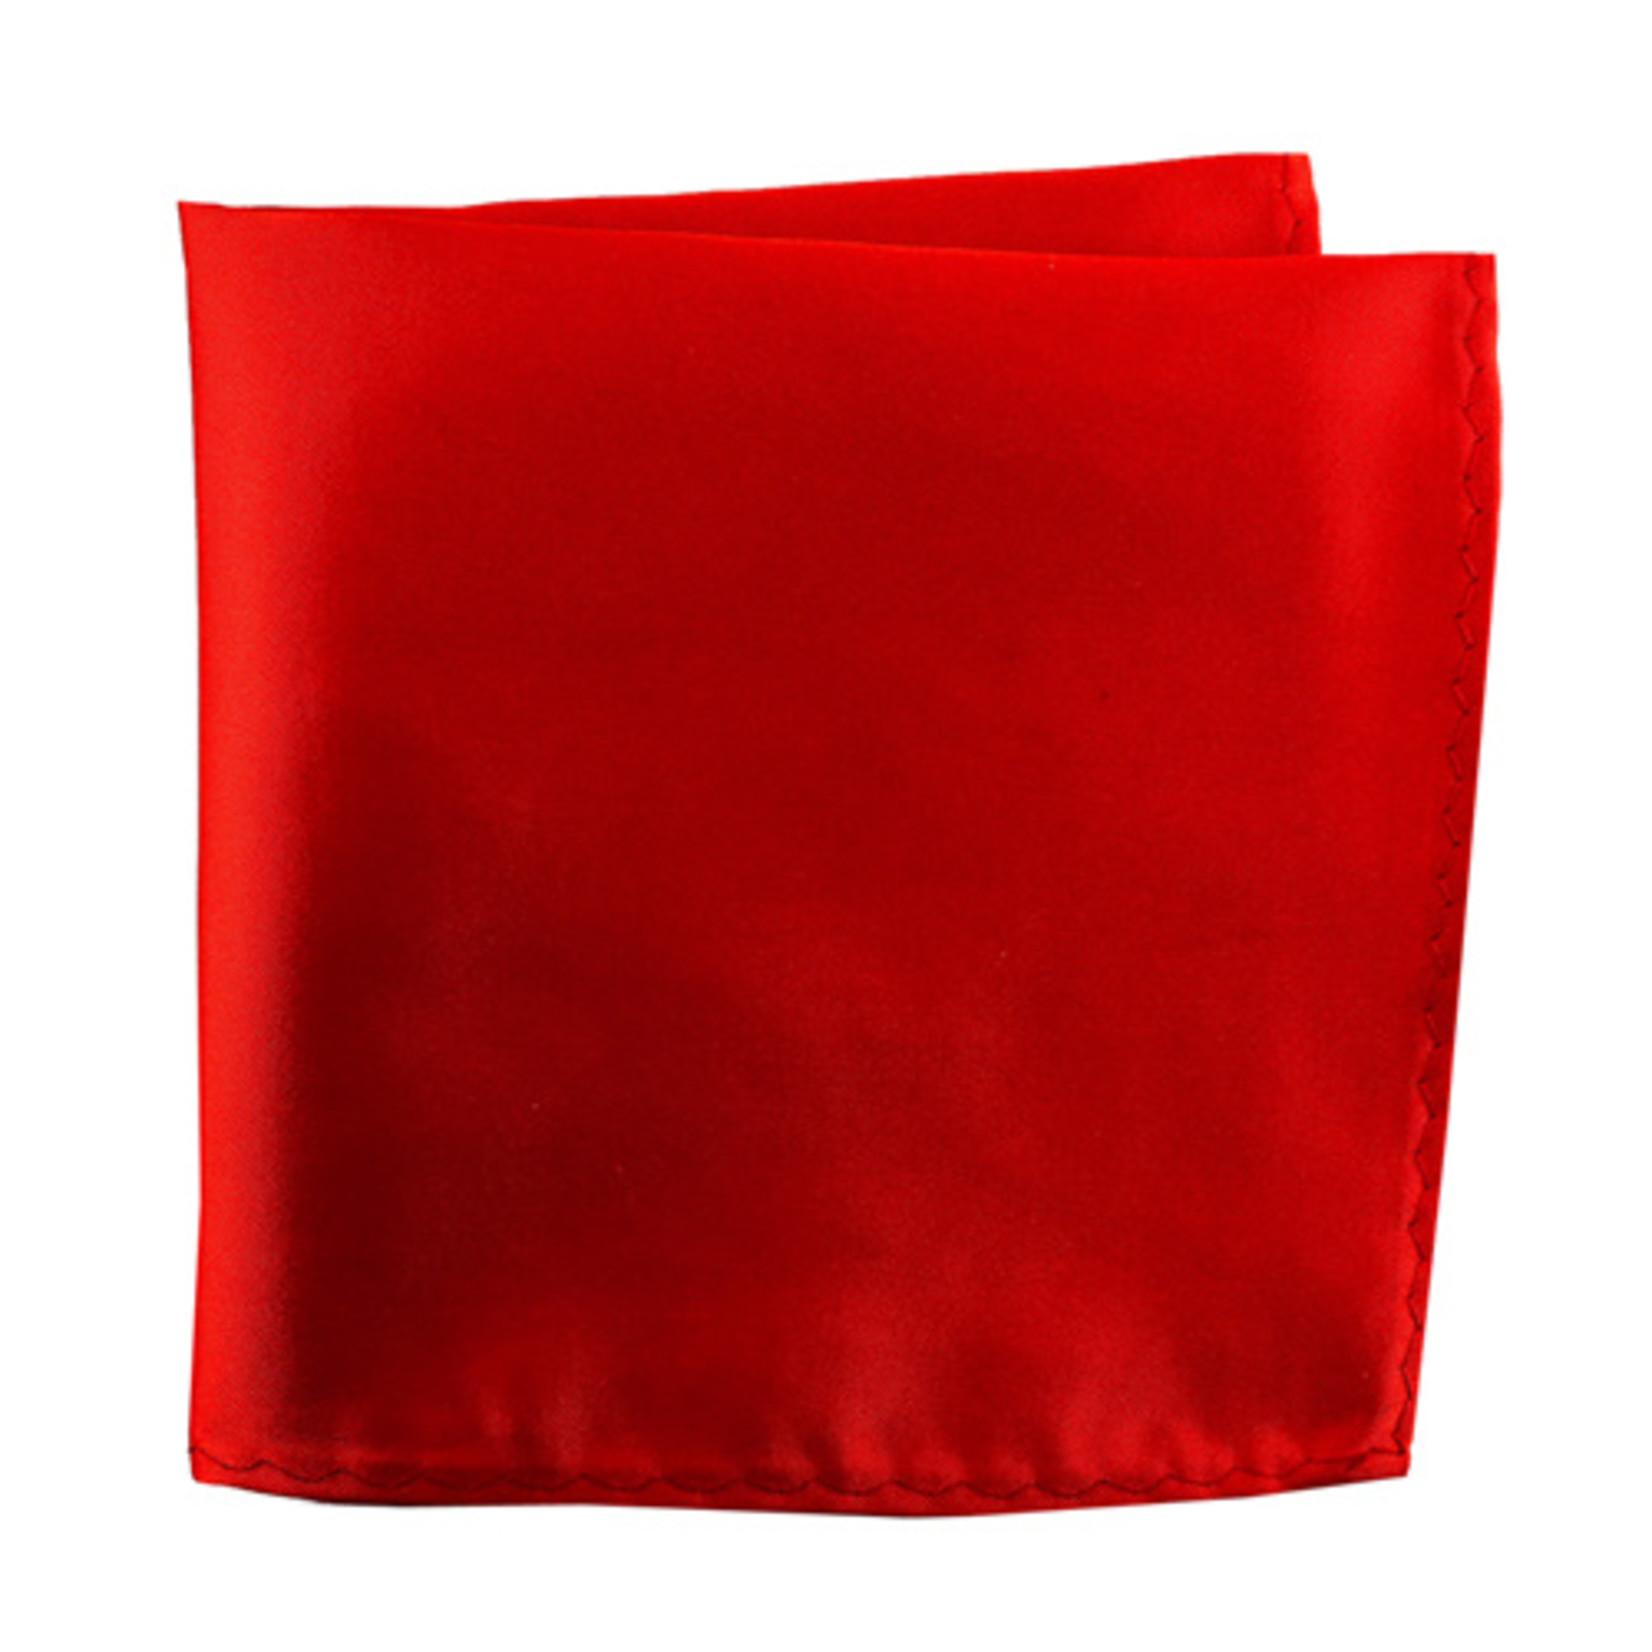 Knotz M100PSQ-37 Solid Light Red Pocket Square